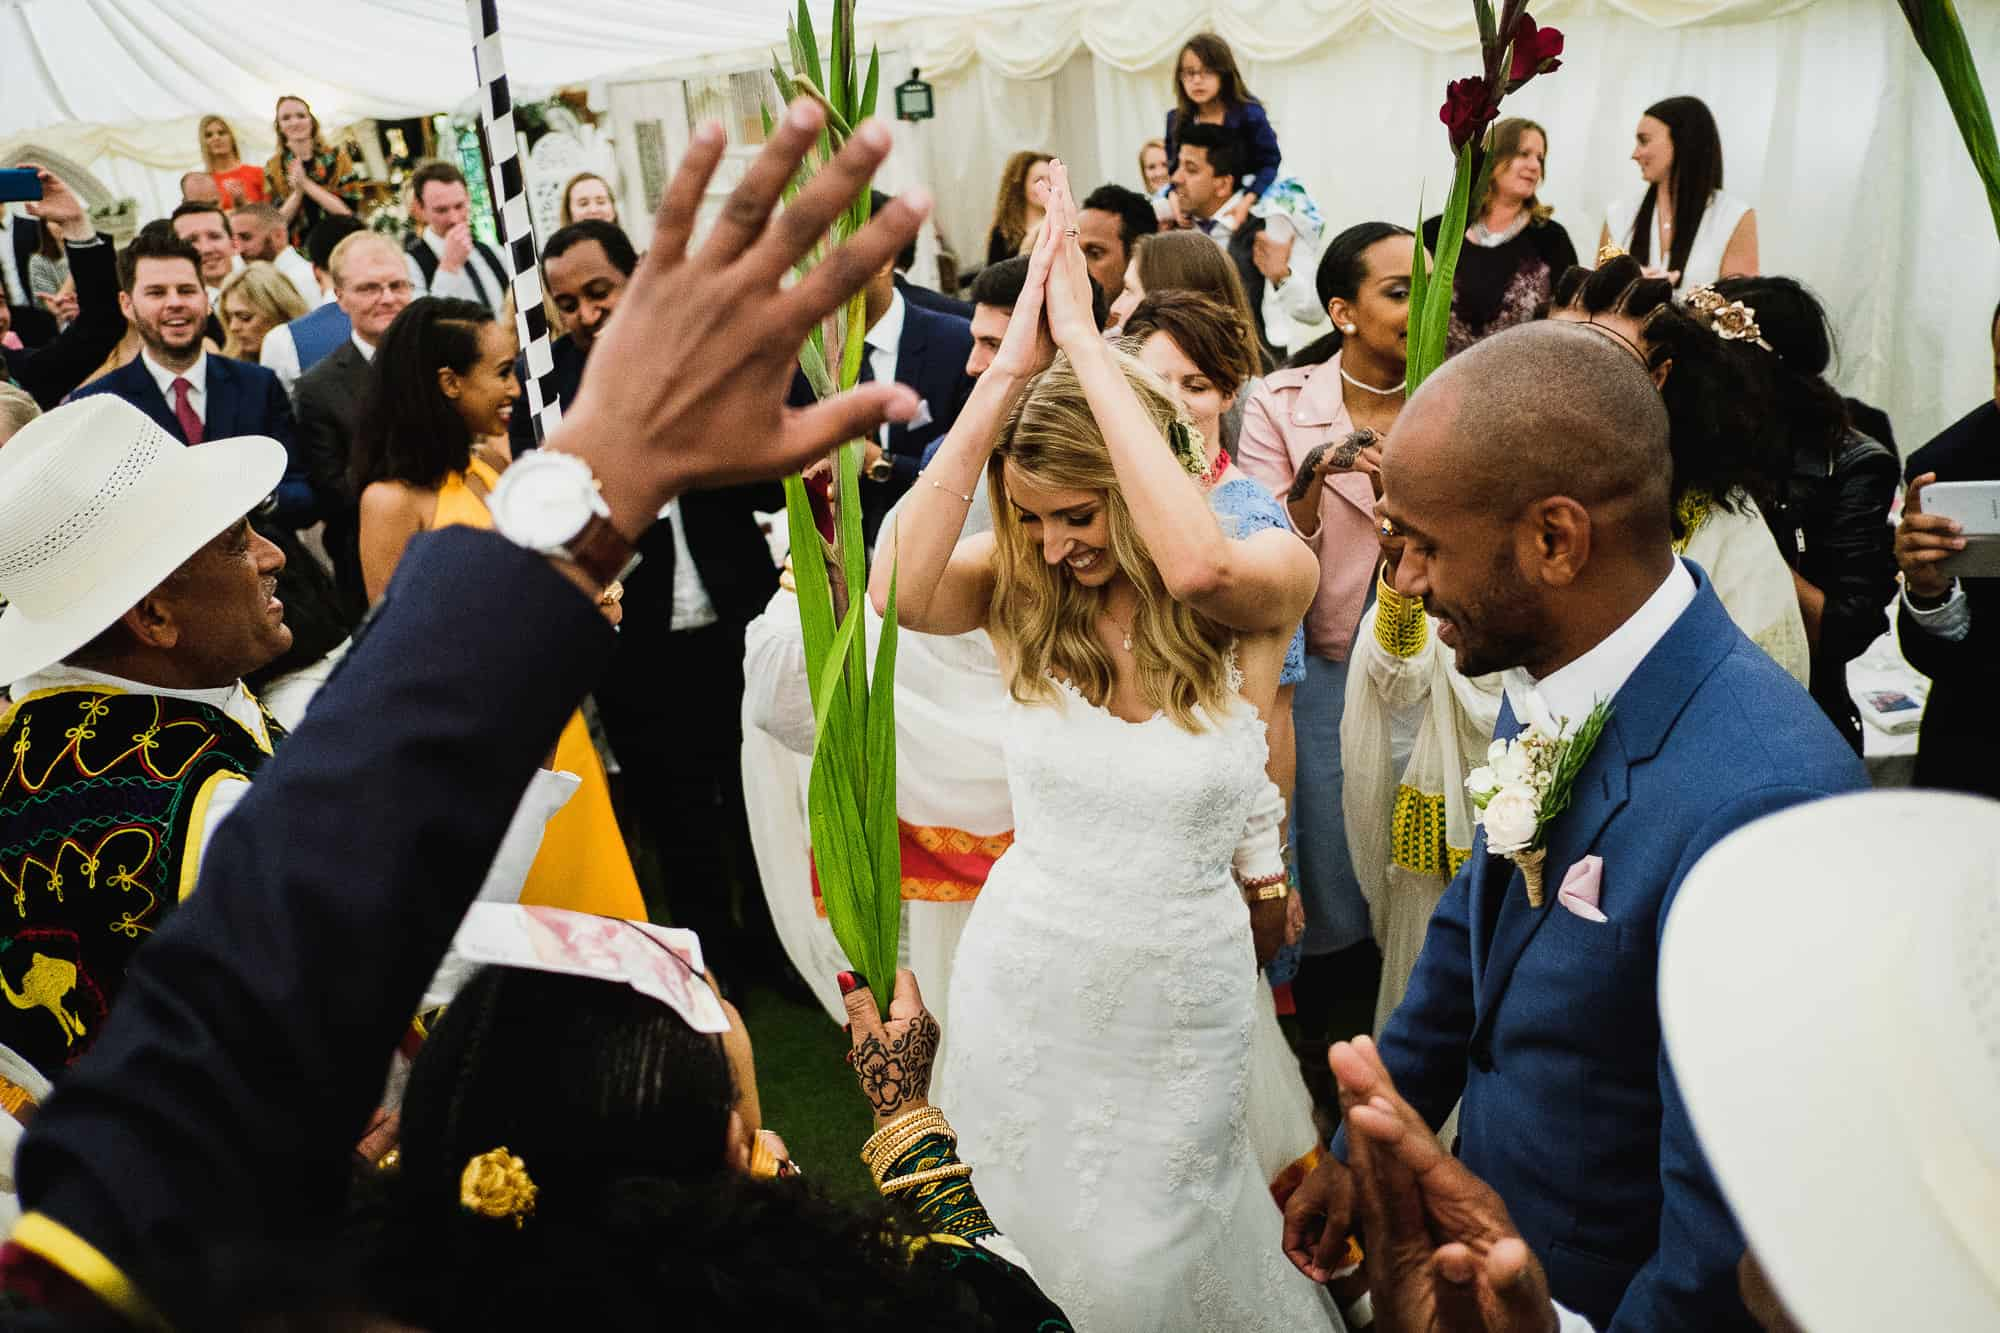 marleybrook-house-wedding-photography-matt-tyler-0048